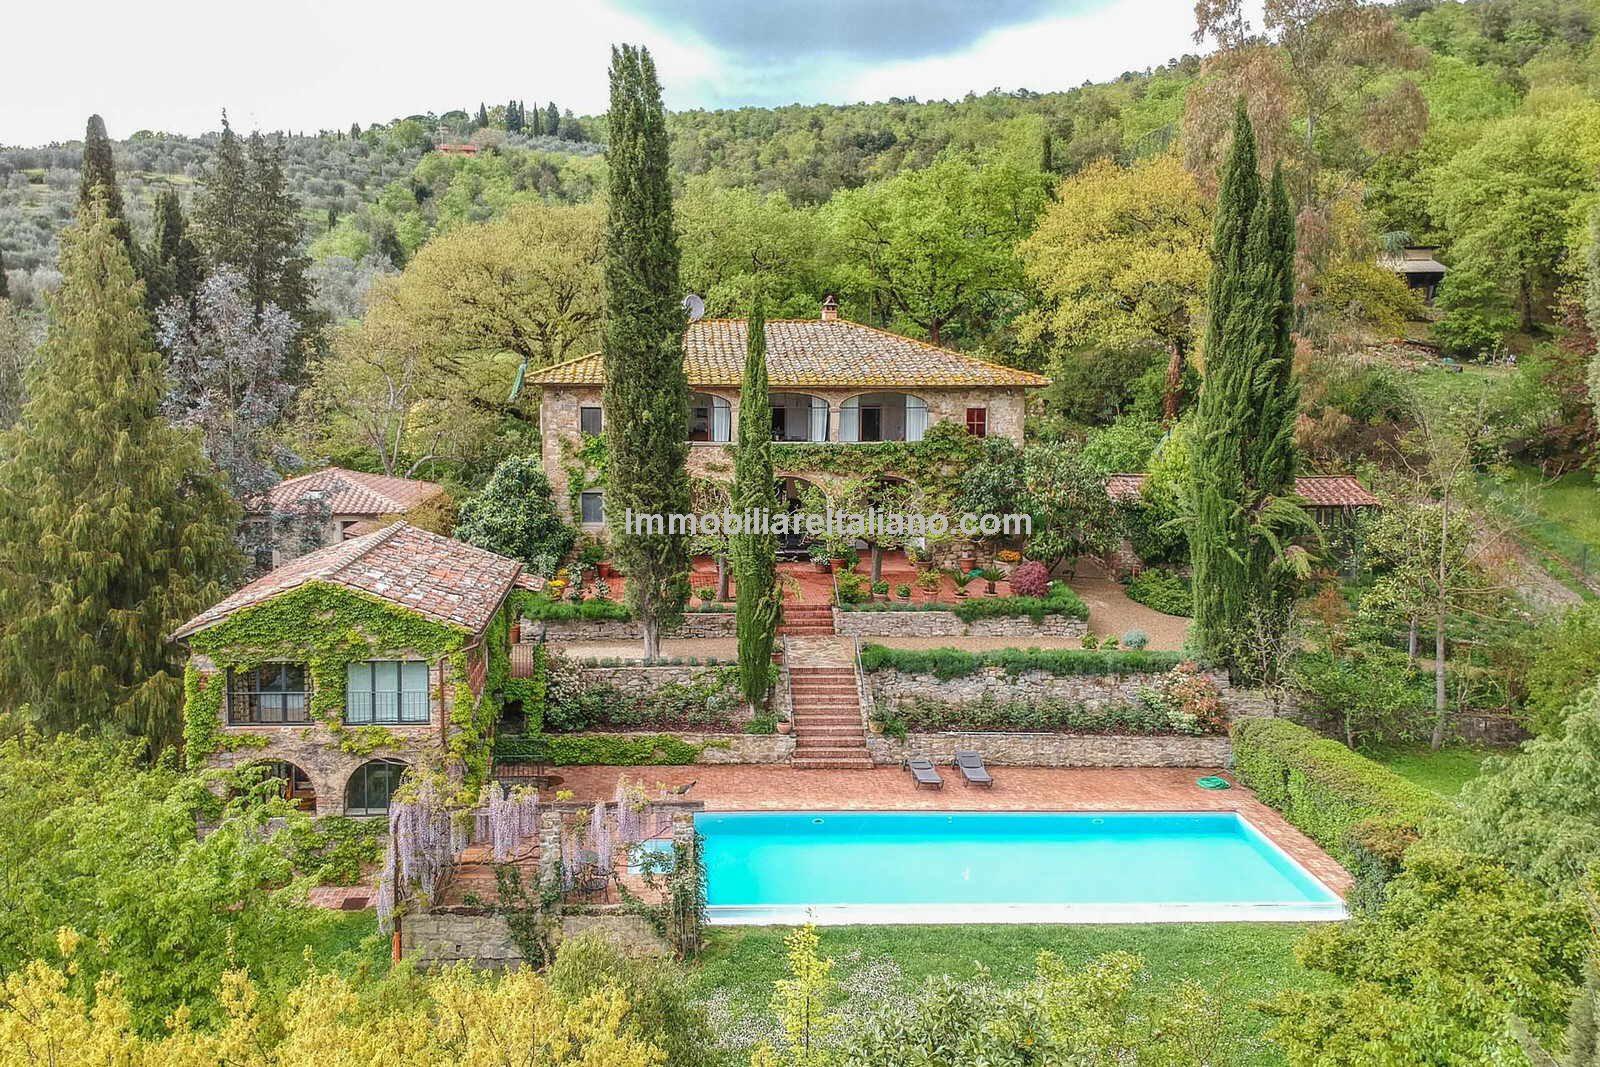 Australian artist Jeffrey Smart's Tuscan home